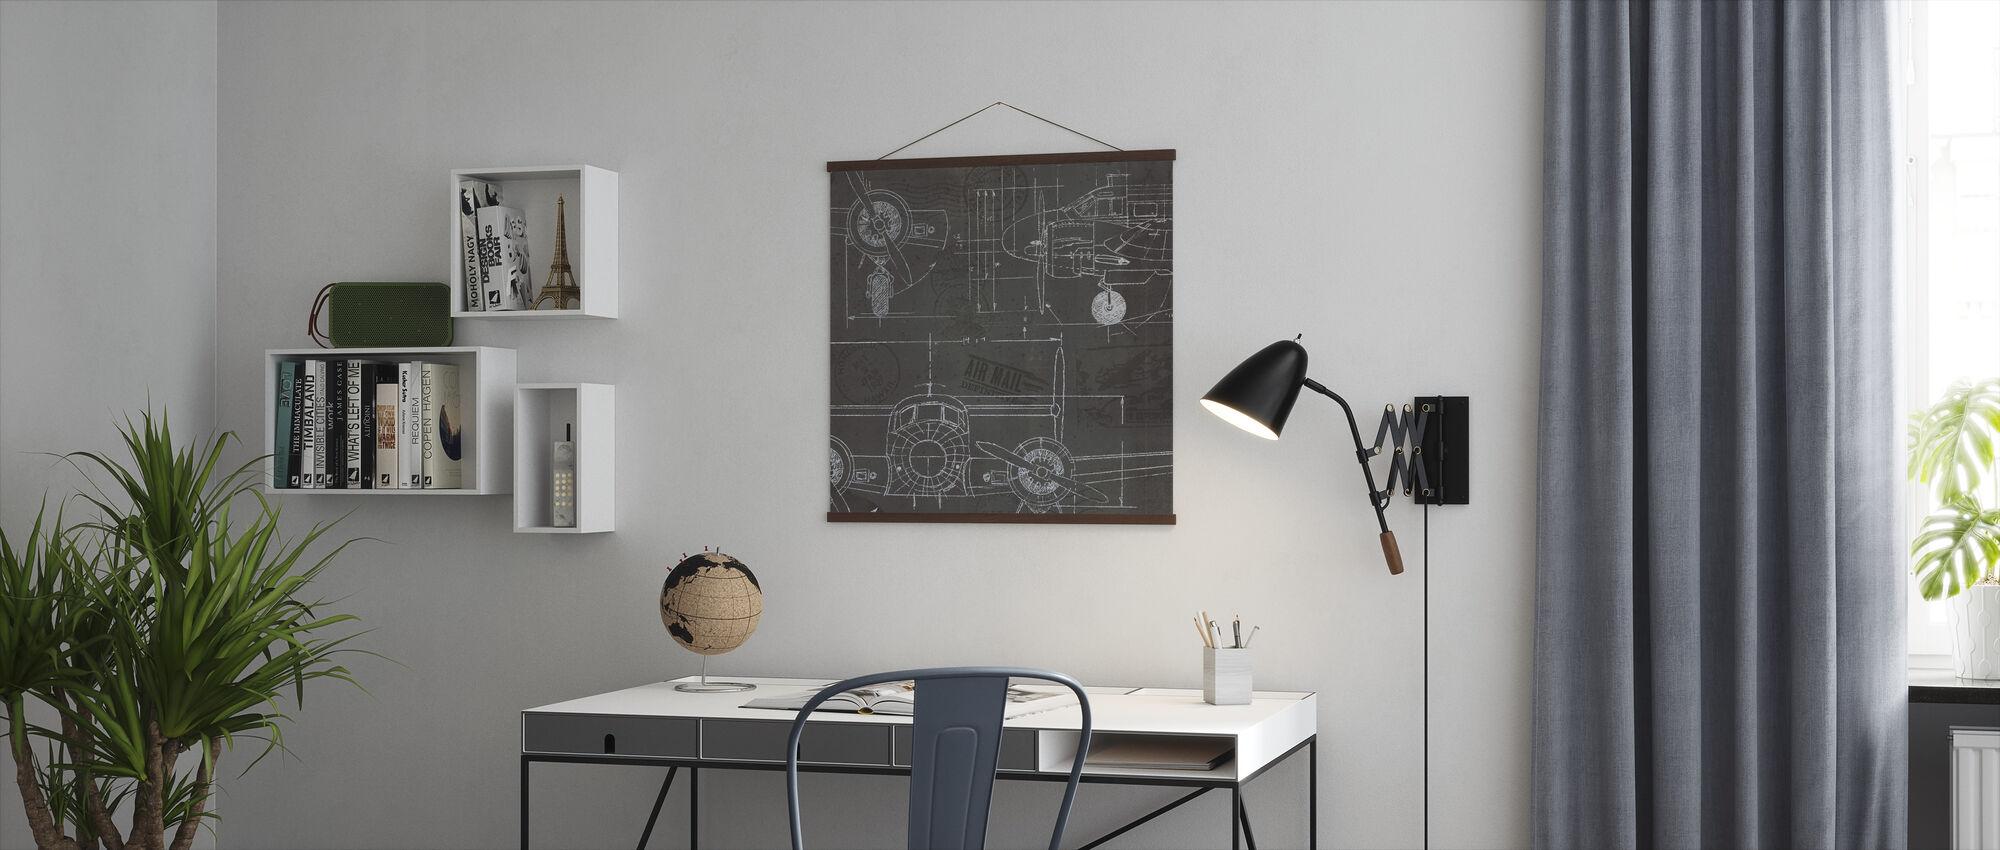 Plane Blueprint 3 - Poster - Office